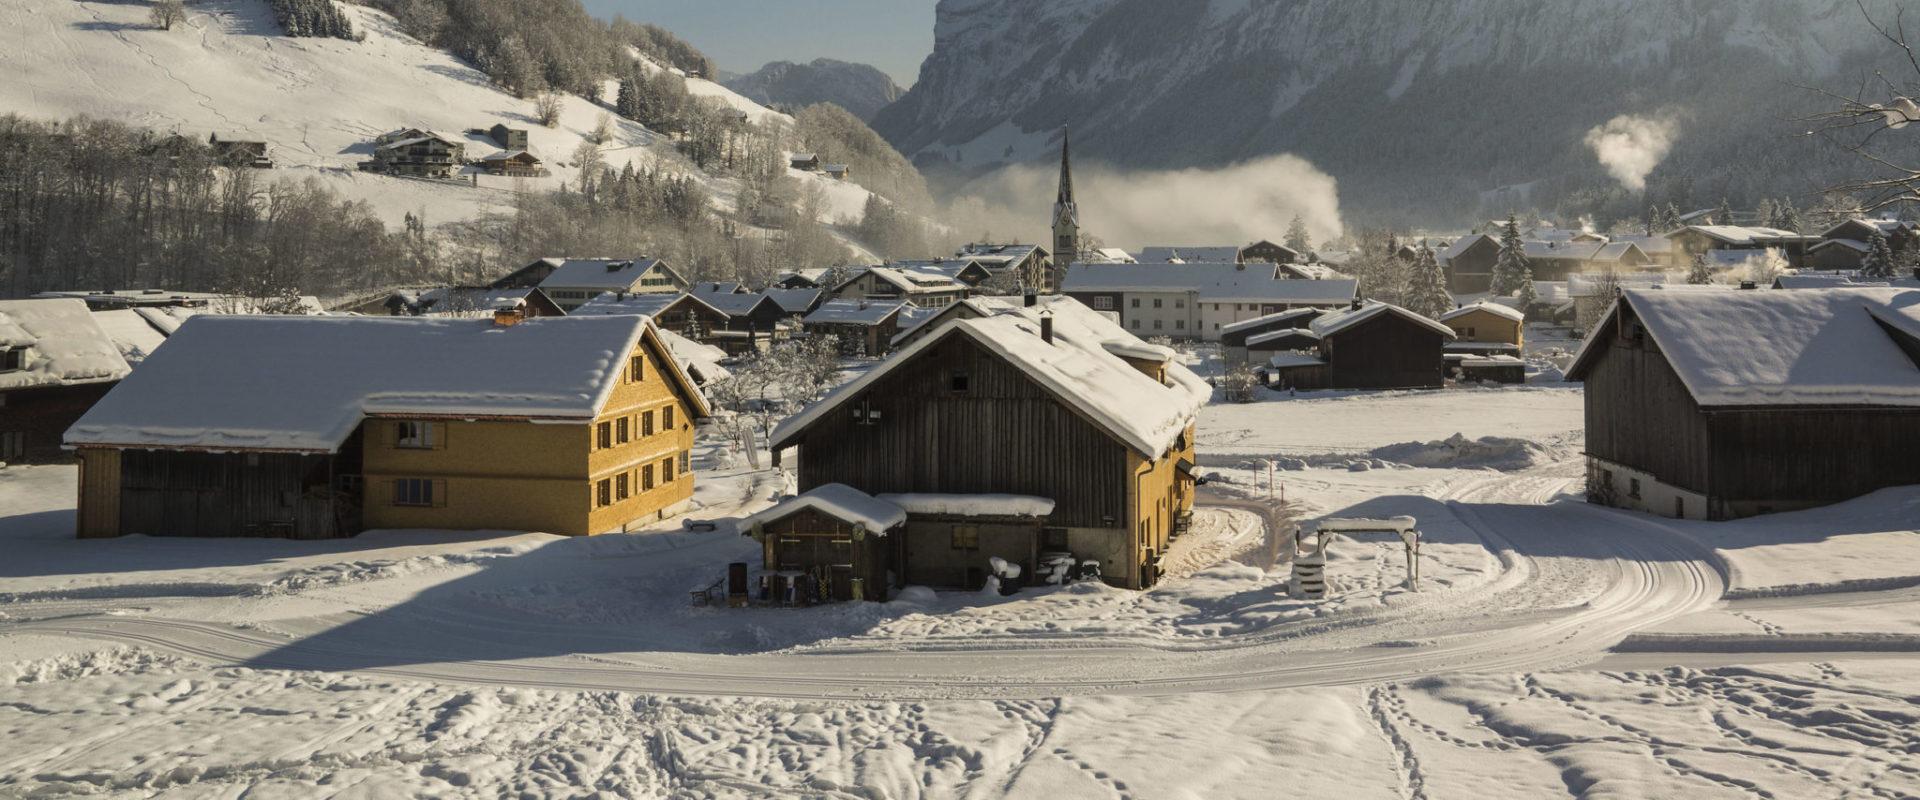 Mellau im Winter © Hermann Hager / Mellau Tourismus